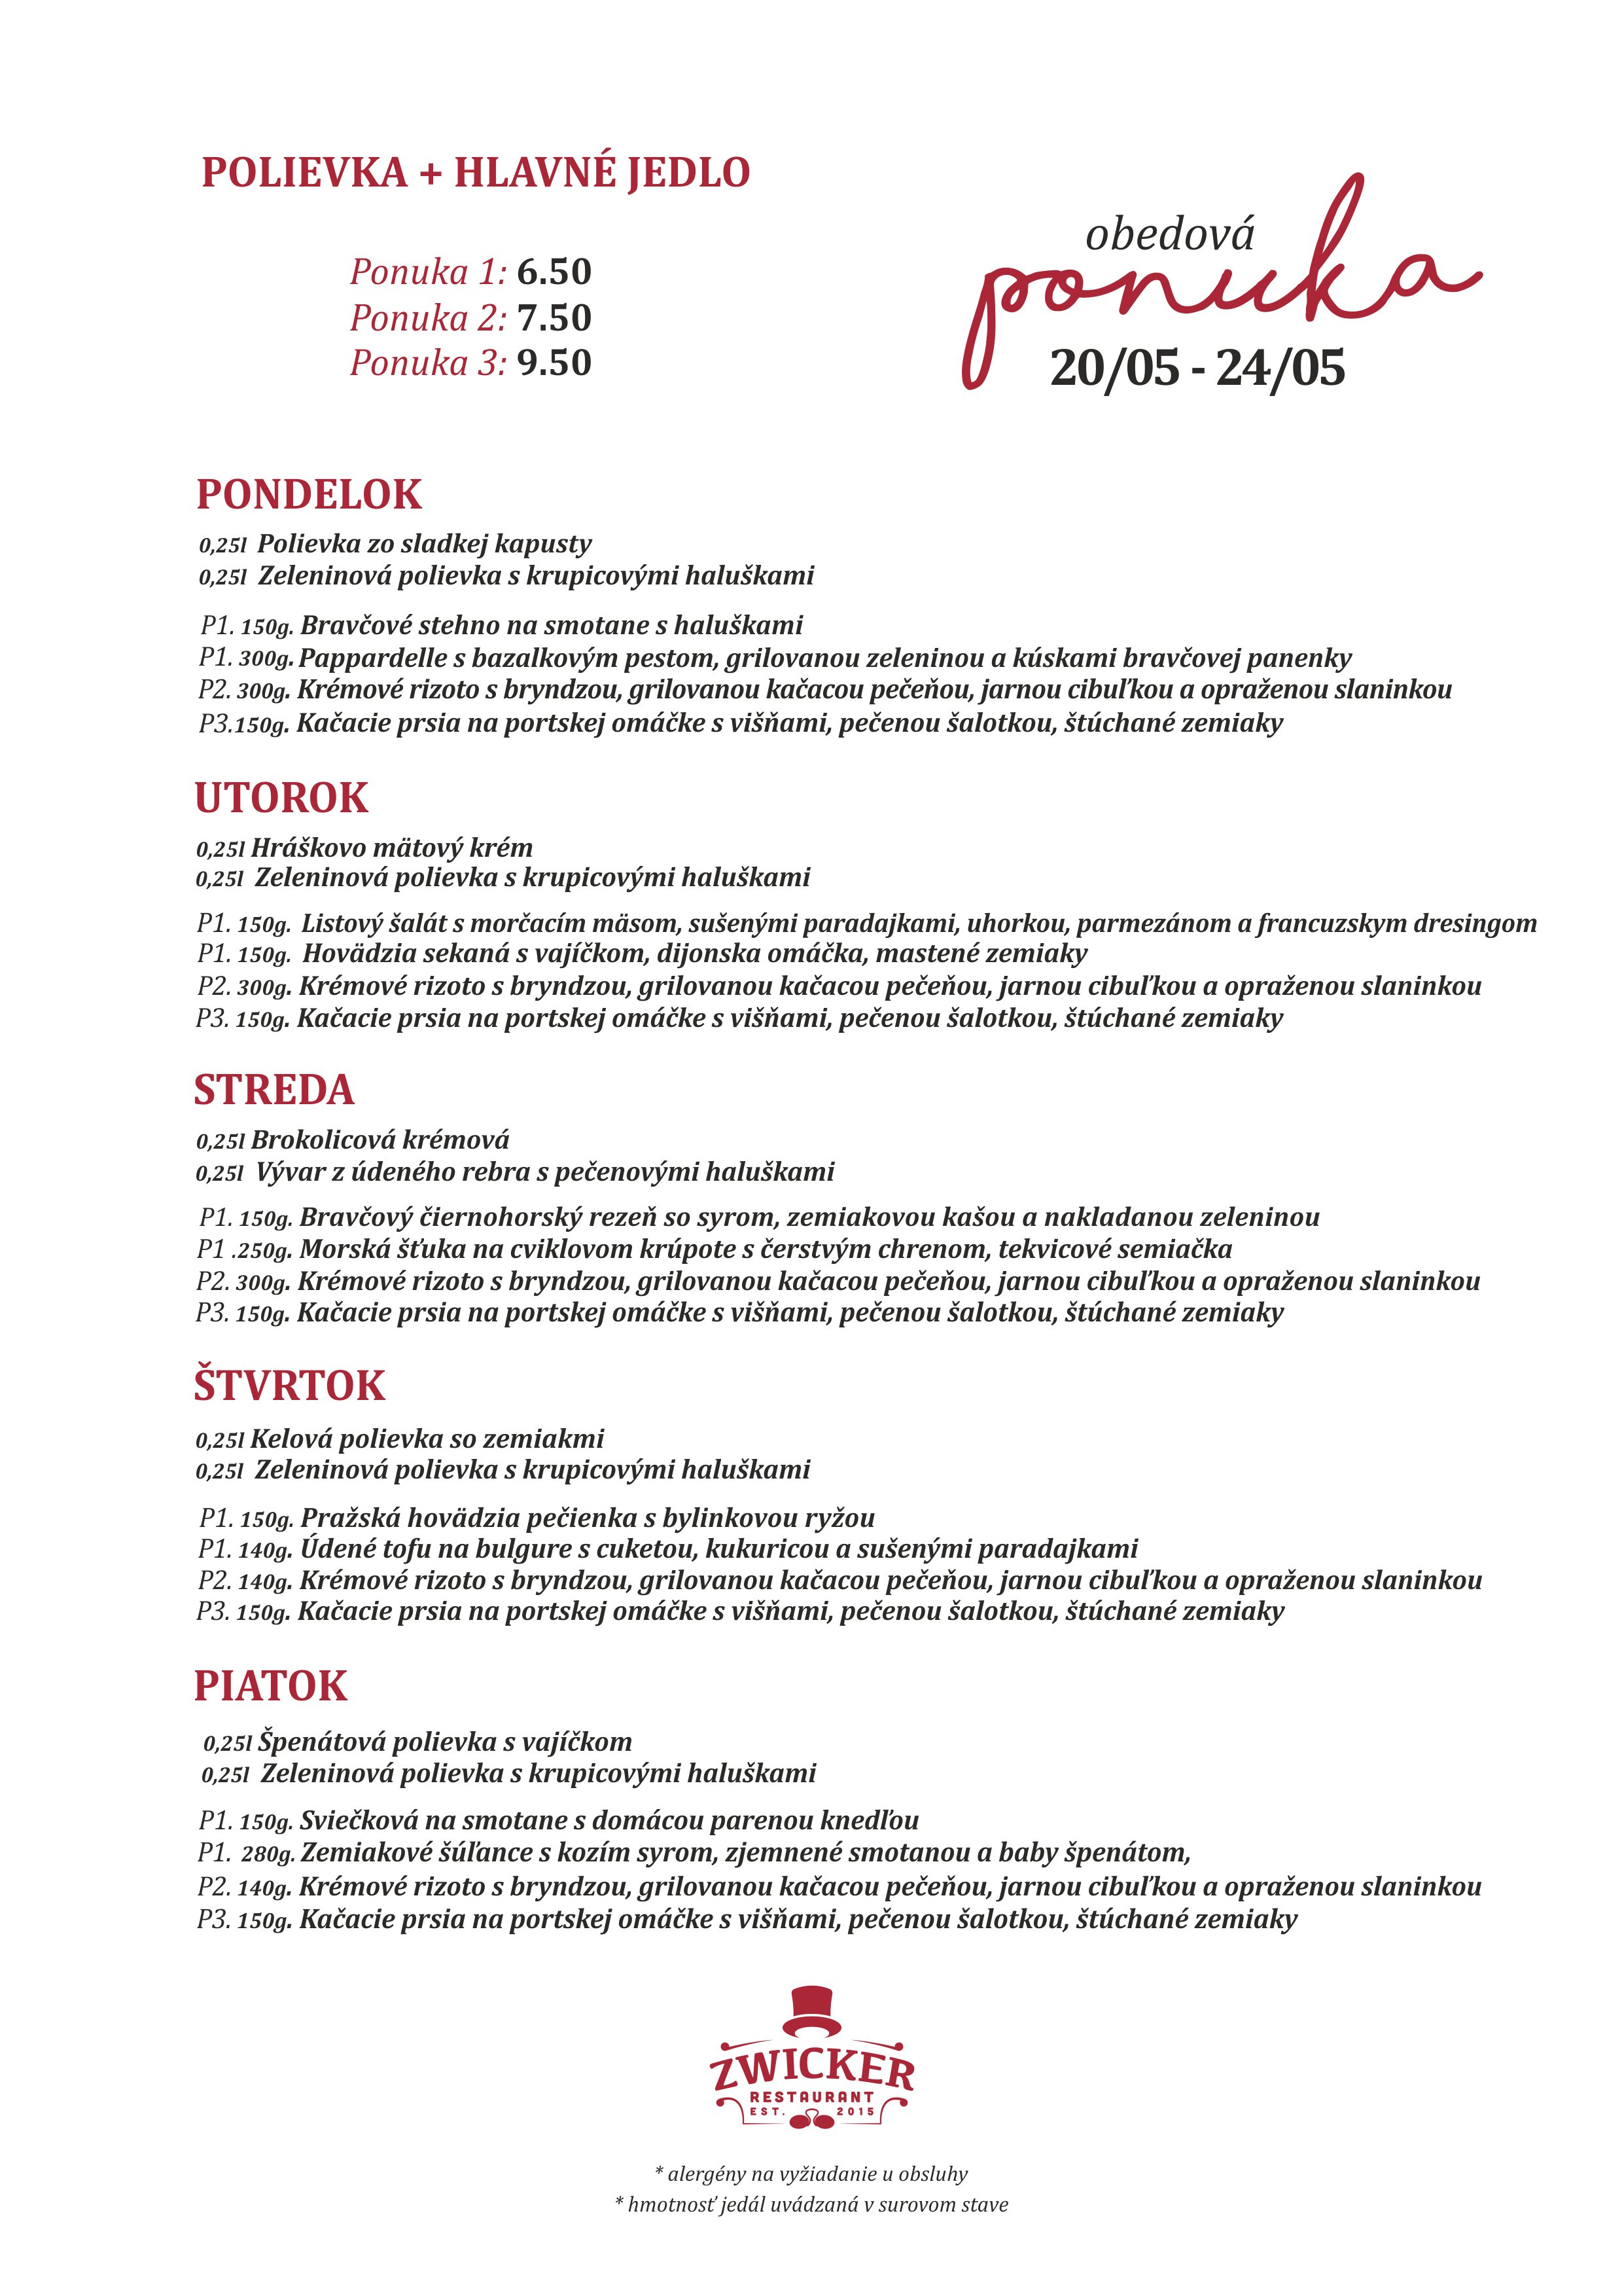 Záloha_OBEDOVE MENU ZWICKER 20_05_19